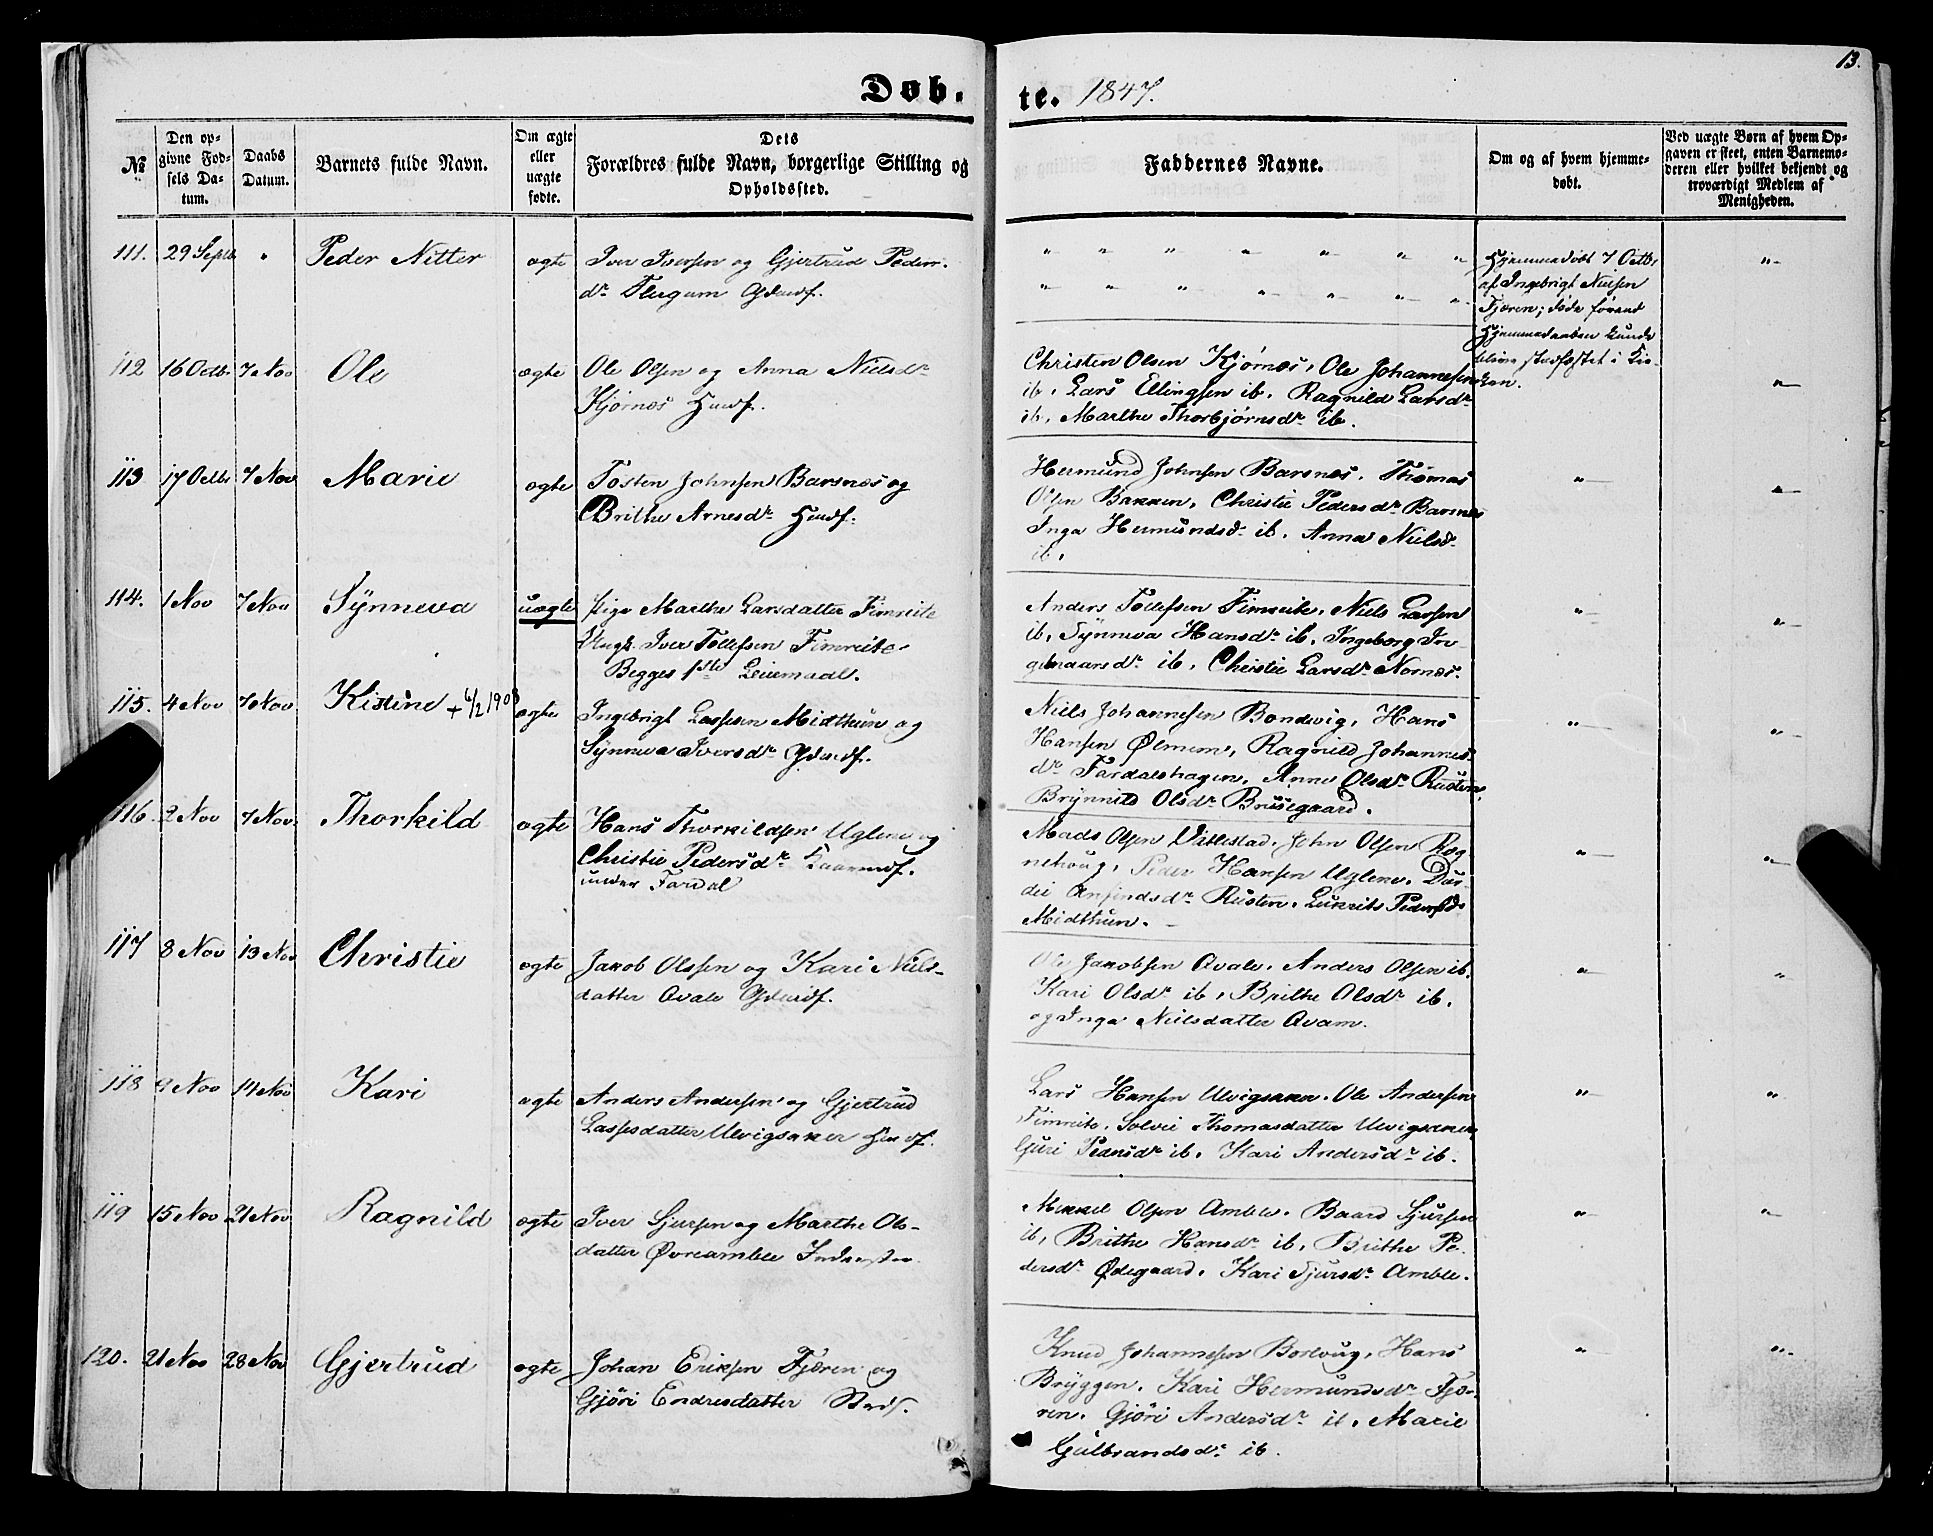 SAB, Sogndal sokneprestembete, H/Haa/Haaa/L0012I: Ministerialbok nr. A 12I, 1847-1859, s. 13